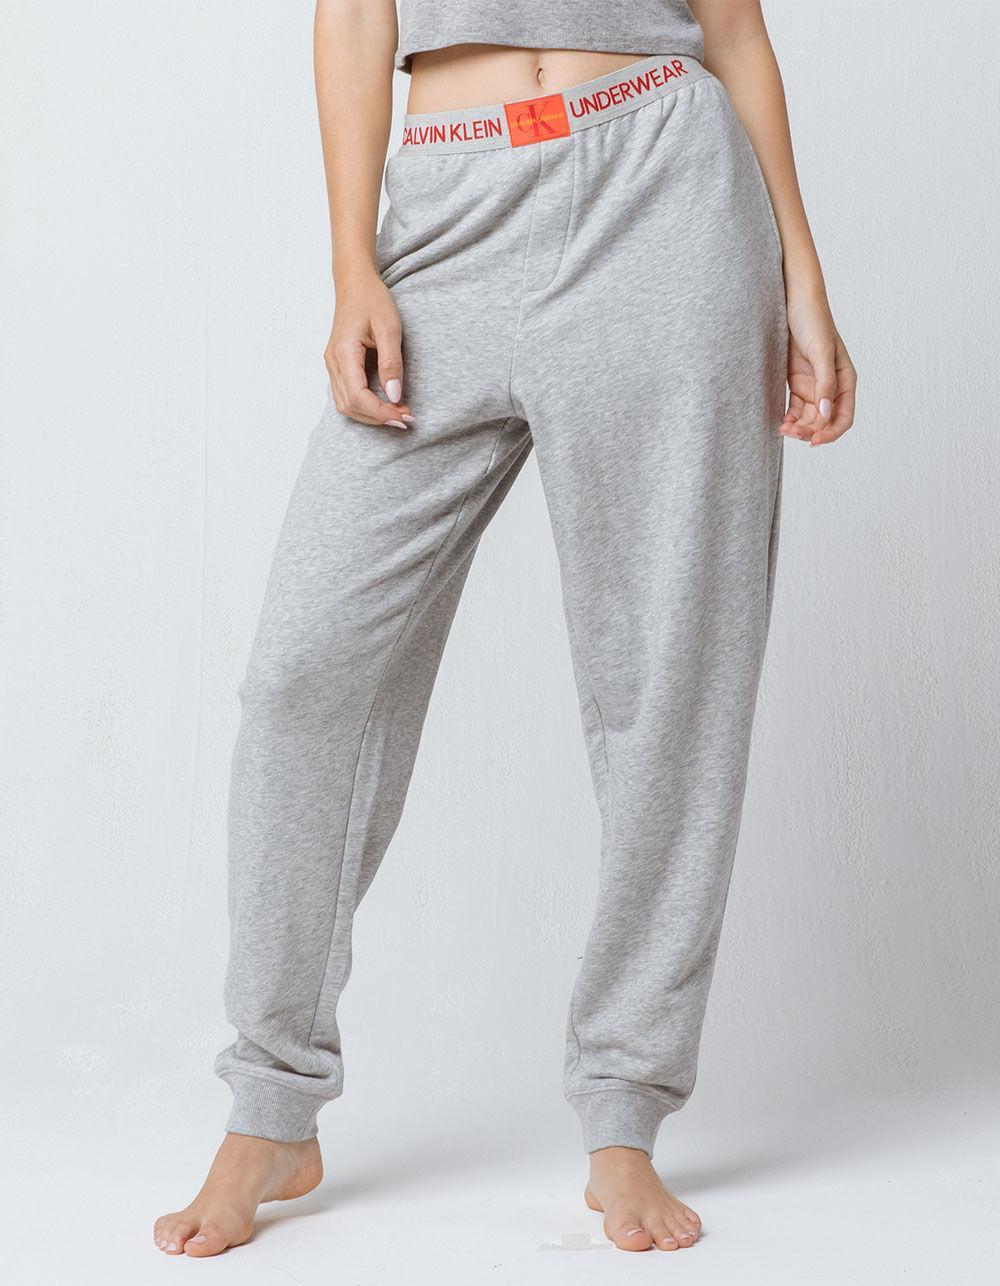 86ab9b8db92f2 Calvin Klein Monogram Logo Heather Gray Womens Jogger Pants in Black ...